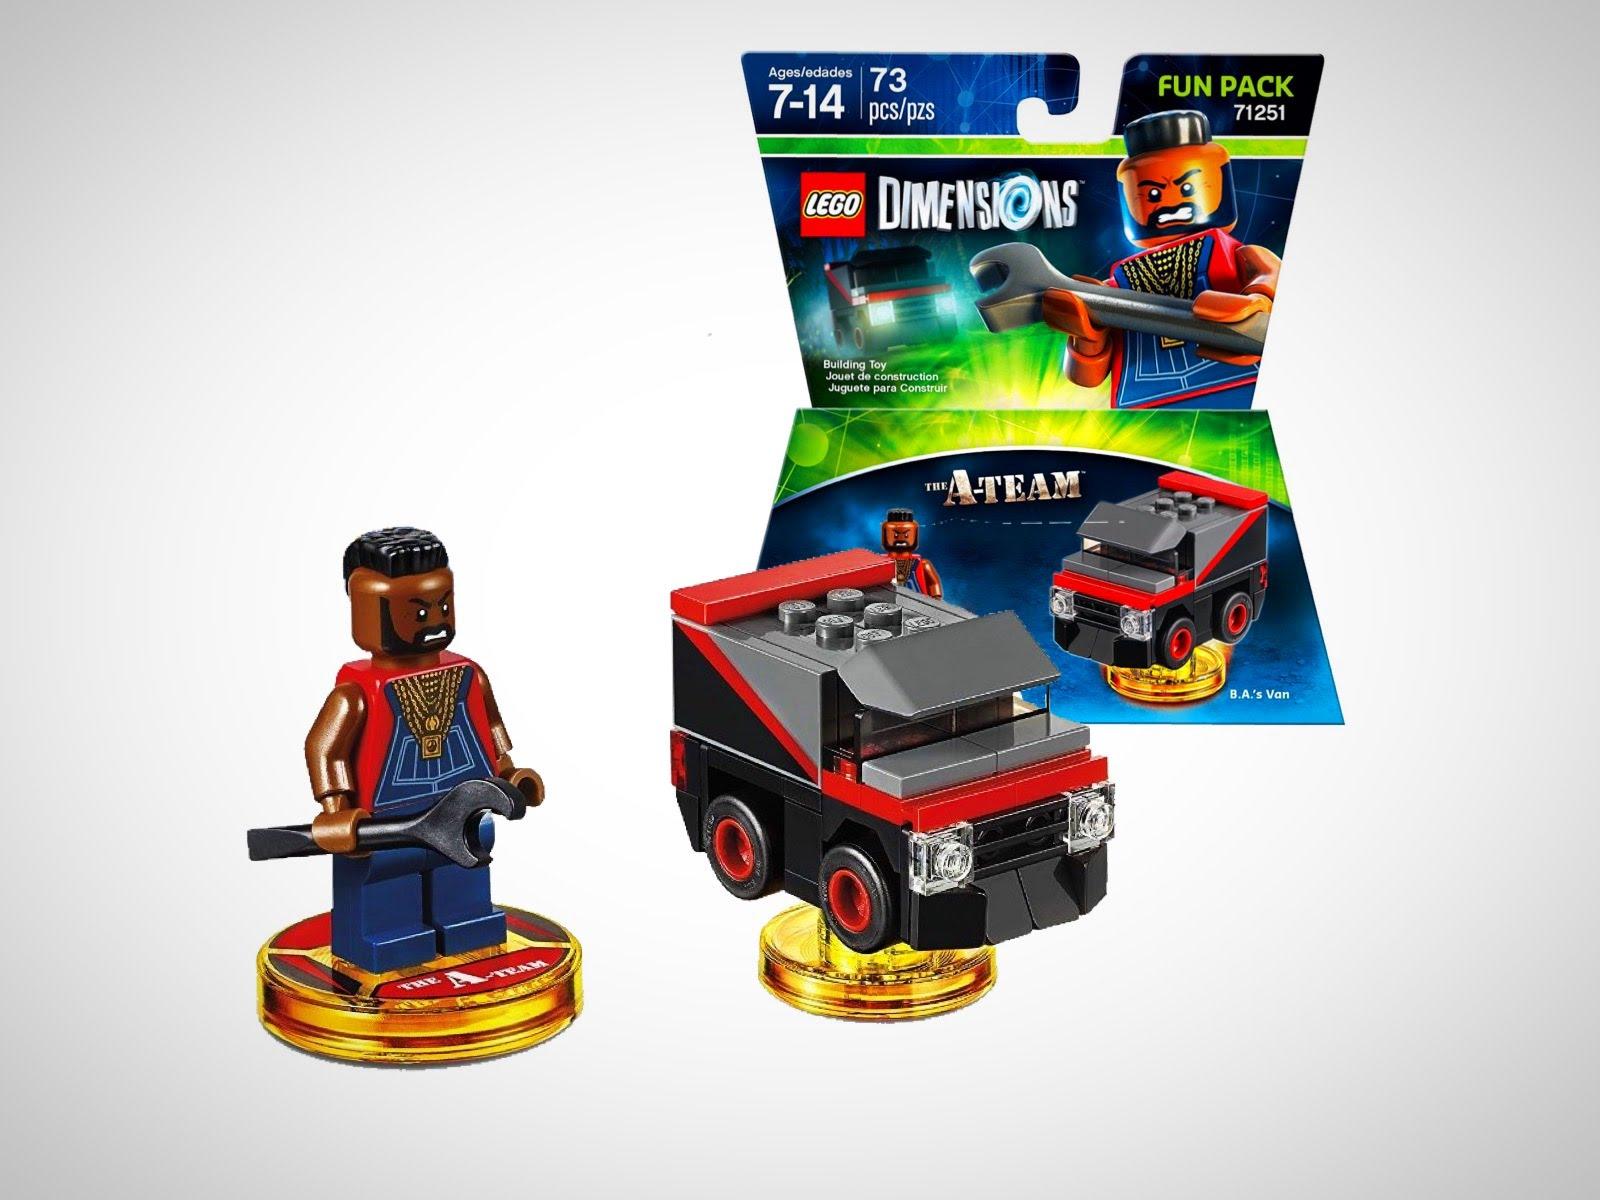 Lego Dimensions Fun Pack 71251